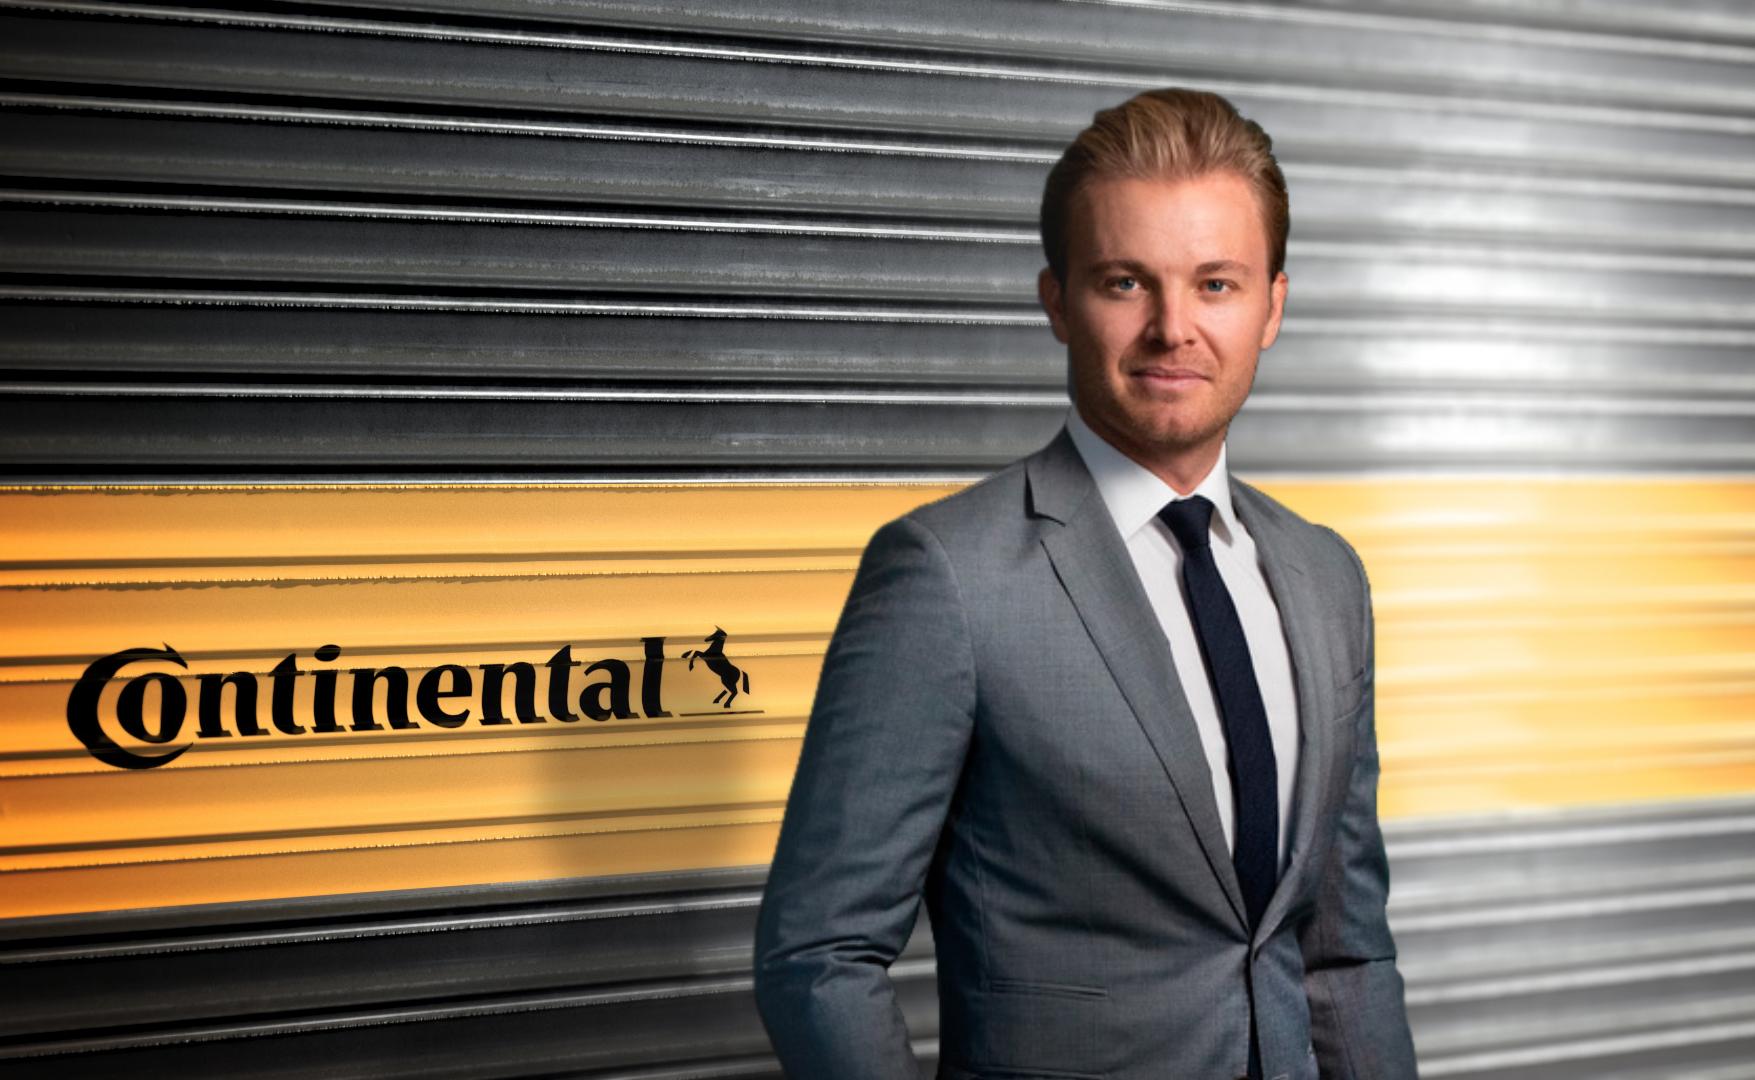 Nico Rosberg, campion mondial la F1 și antreprenor pentru sustenabilitate, este noul ambasador al mărcii Continental - Articole anvelope iarna, vara, all season